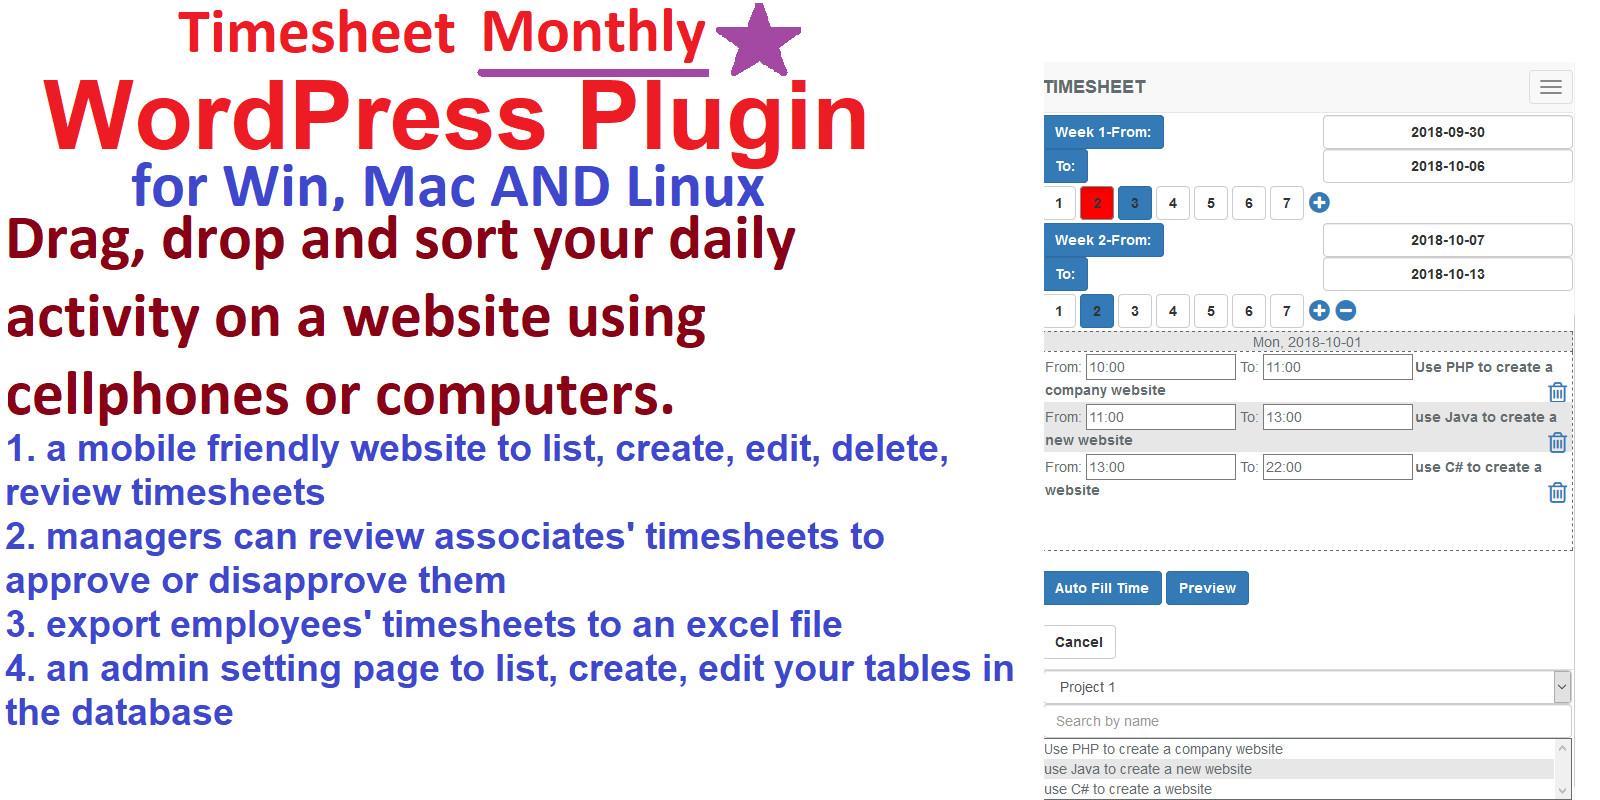 Timesheet Management System WordPress Plugin